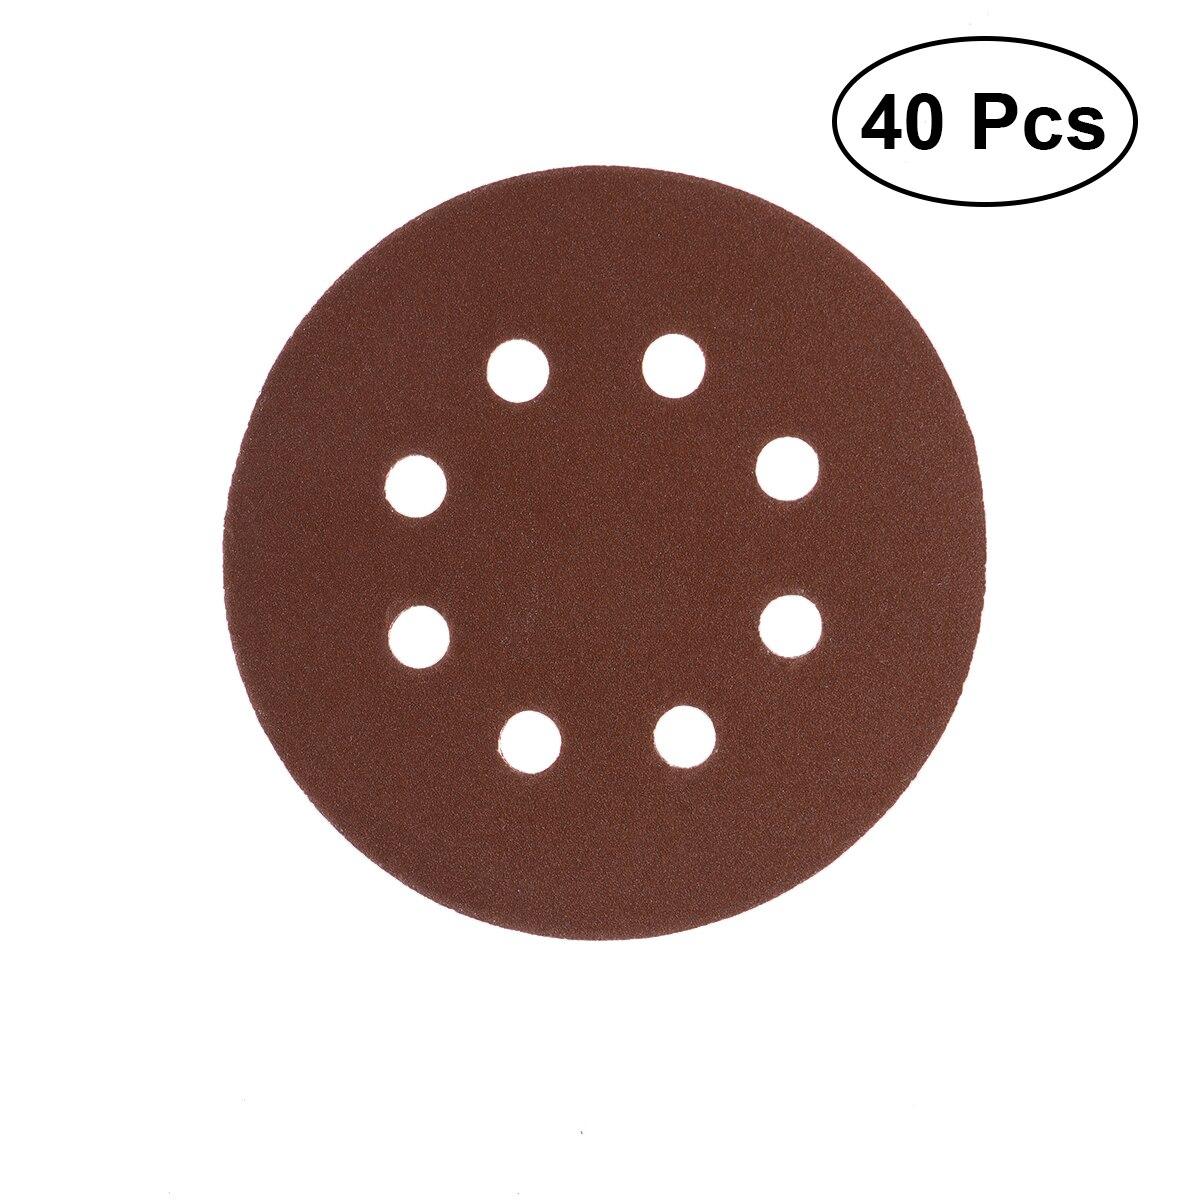 40pcs 8 Hole Abrasive Sandpaper 5 Inch Sanding Discs 60# 80# 120# 210# Grit For Bosch PEX 220/300 Random Orbital Sander 125mm